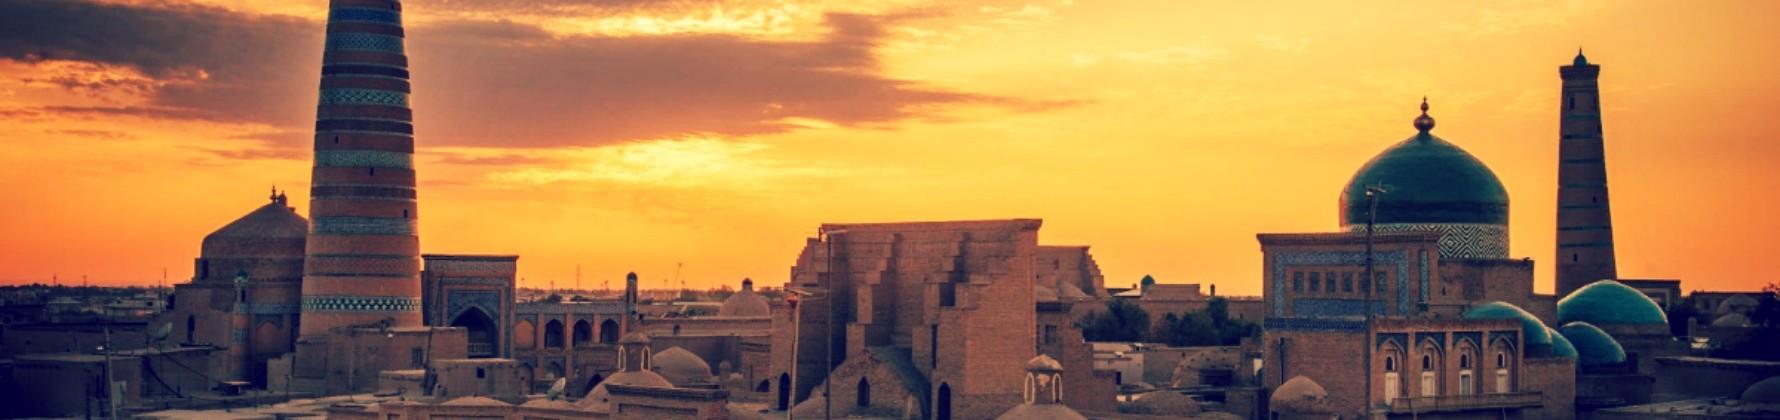 History and Uzbekistan Superior - 1